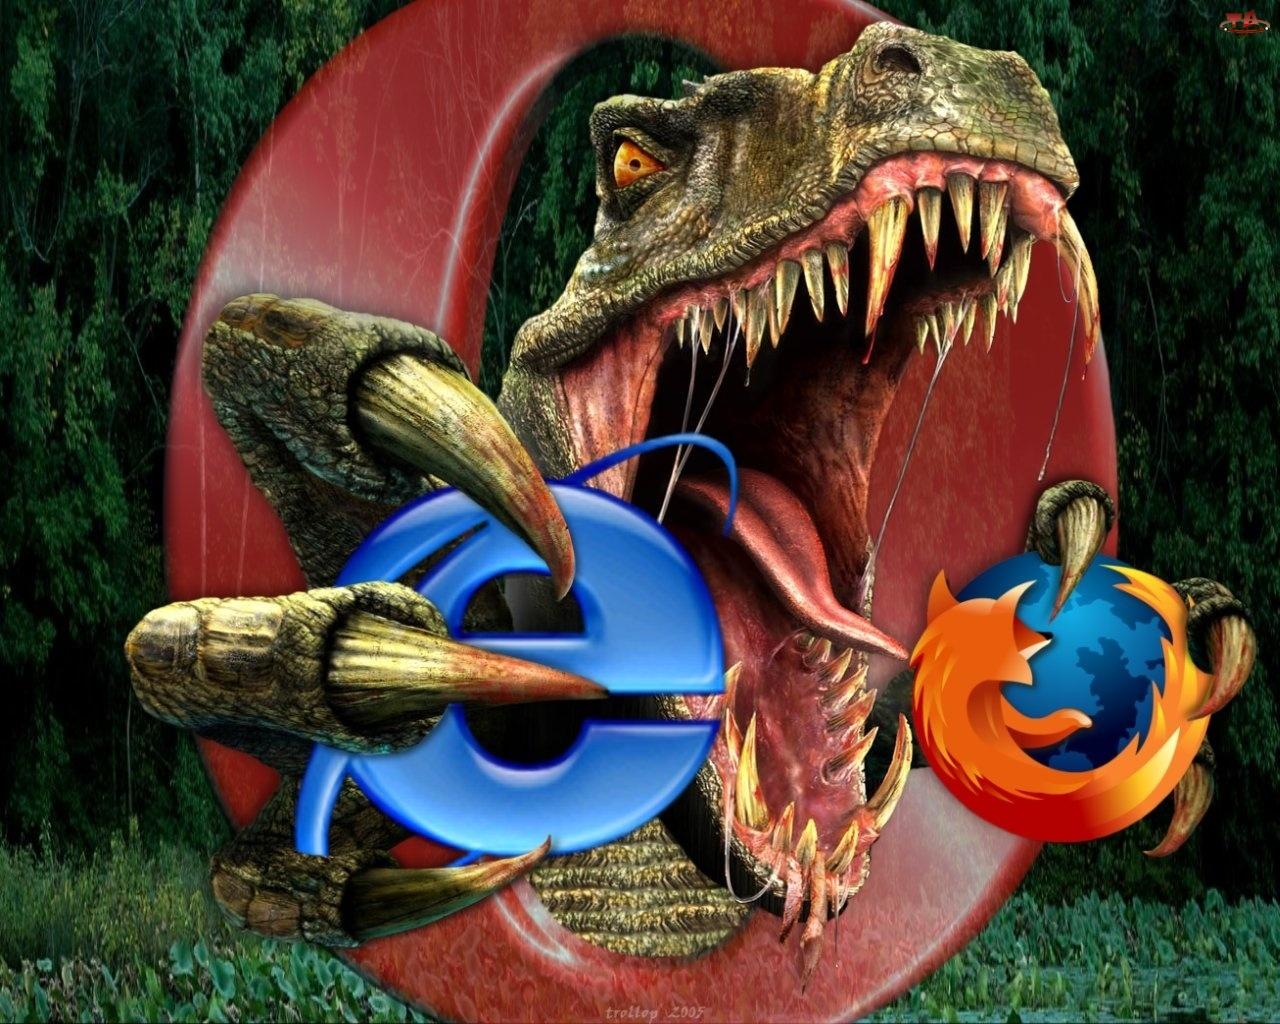 Dinozaur, Opera, FireFox, Internet Explorer